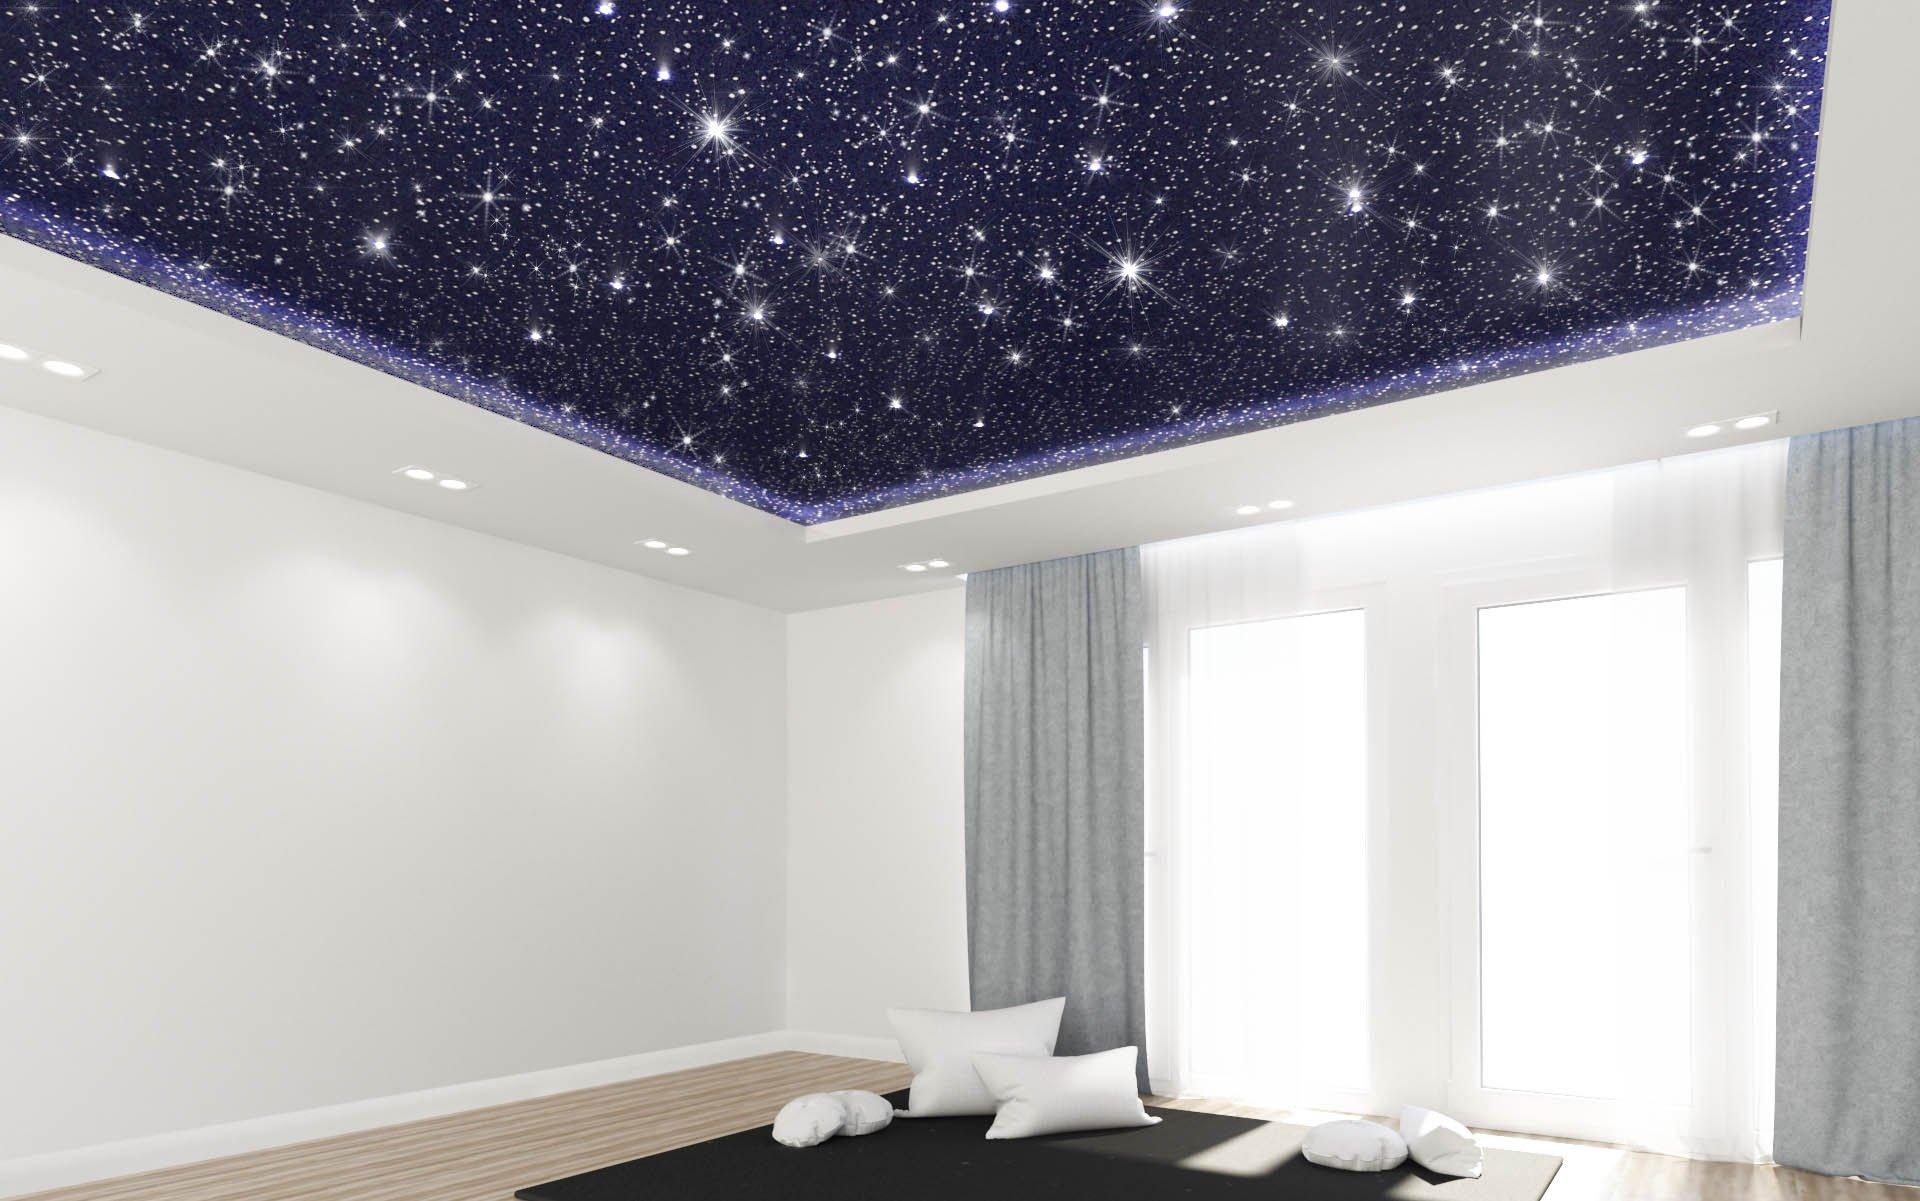 Потолок звездное небо #3